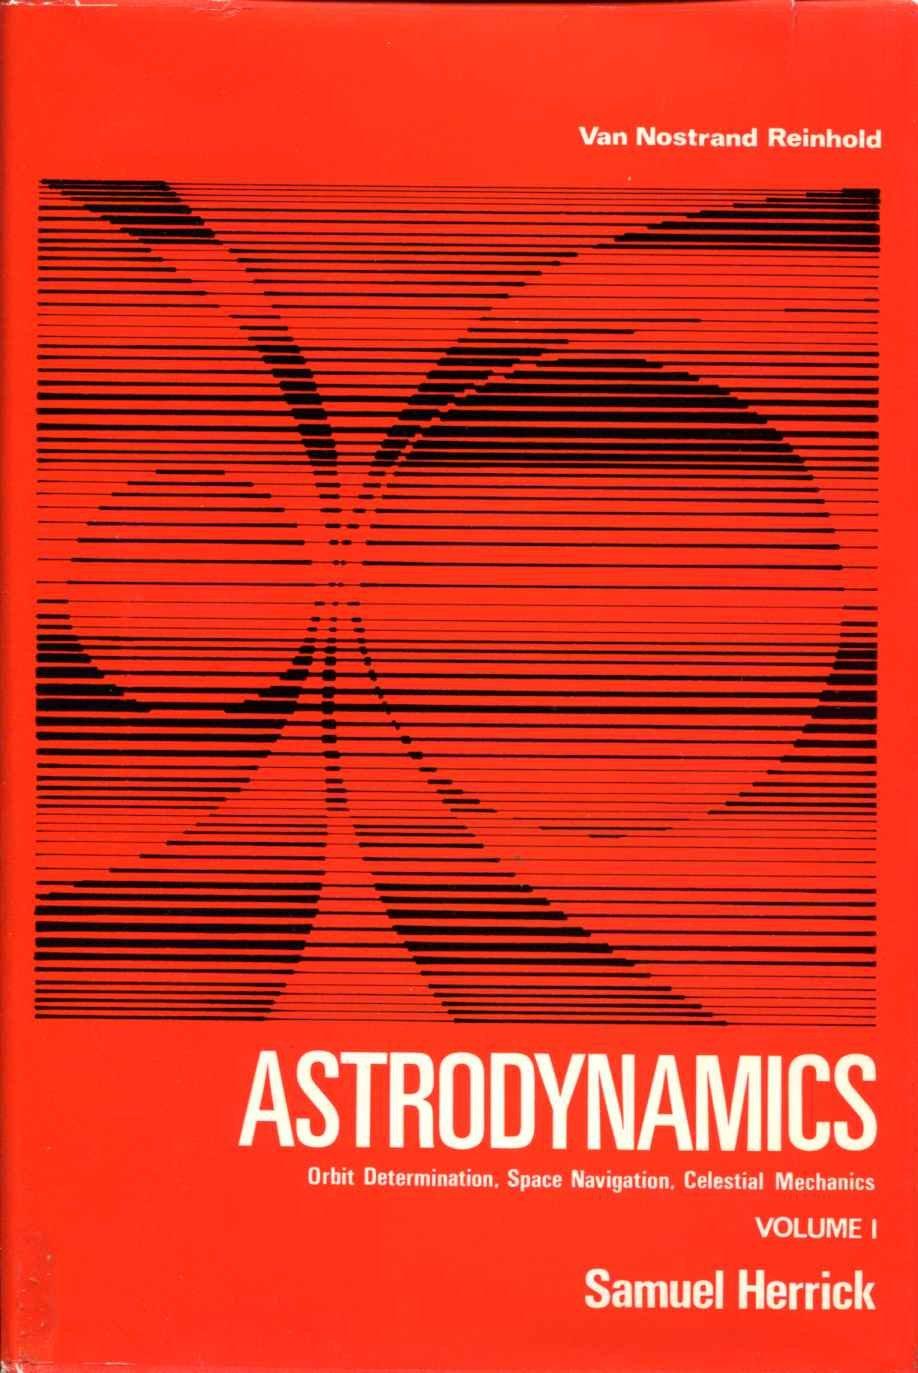 Astrodynamics: Orbit Determination, Space Navigation, Celestial Mechanics, Volume 1